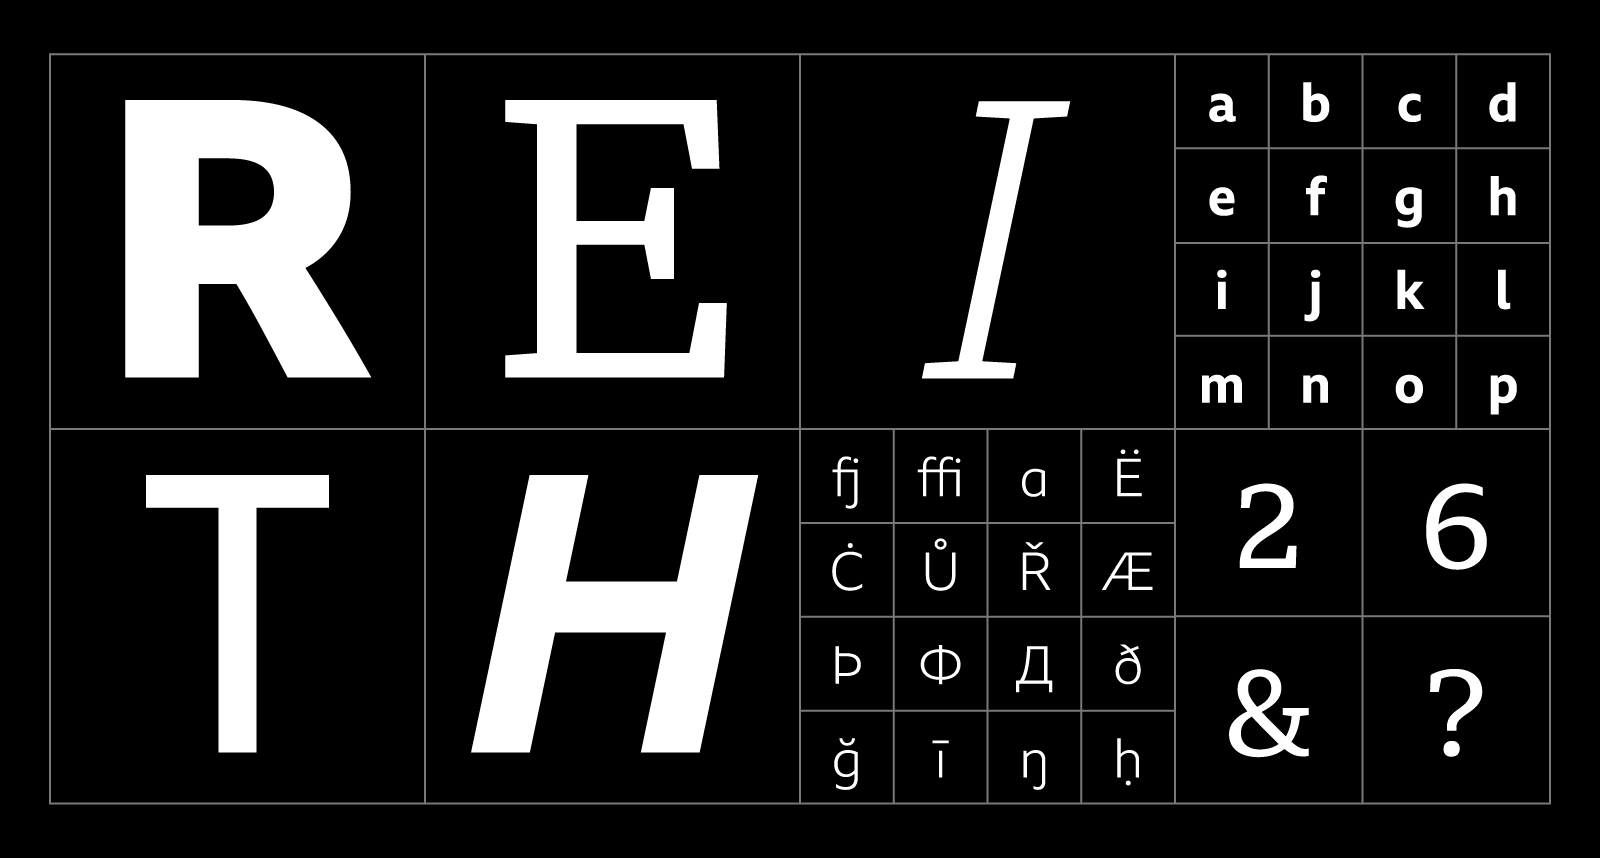 BBC Reith typeface